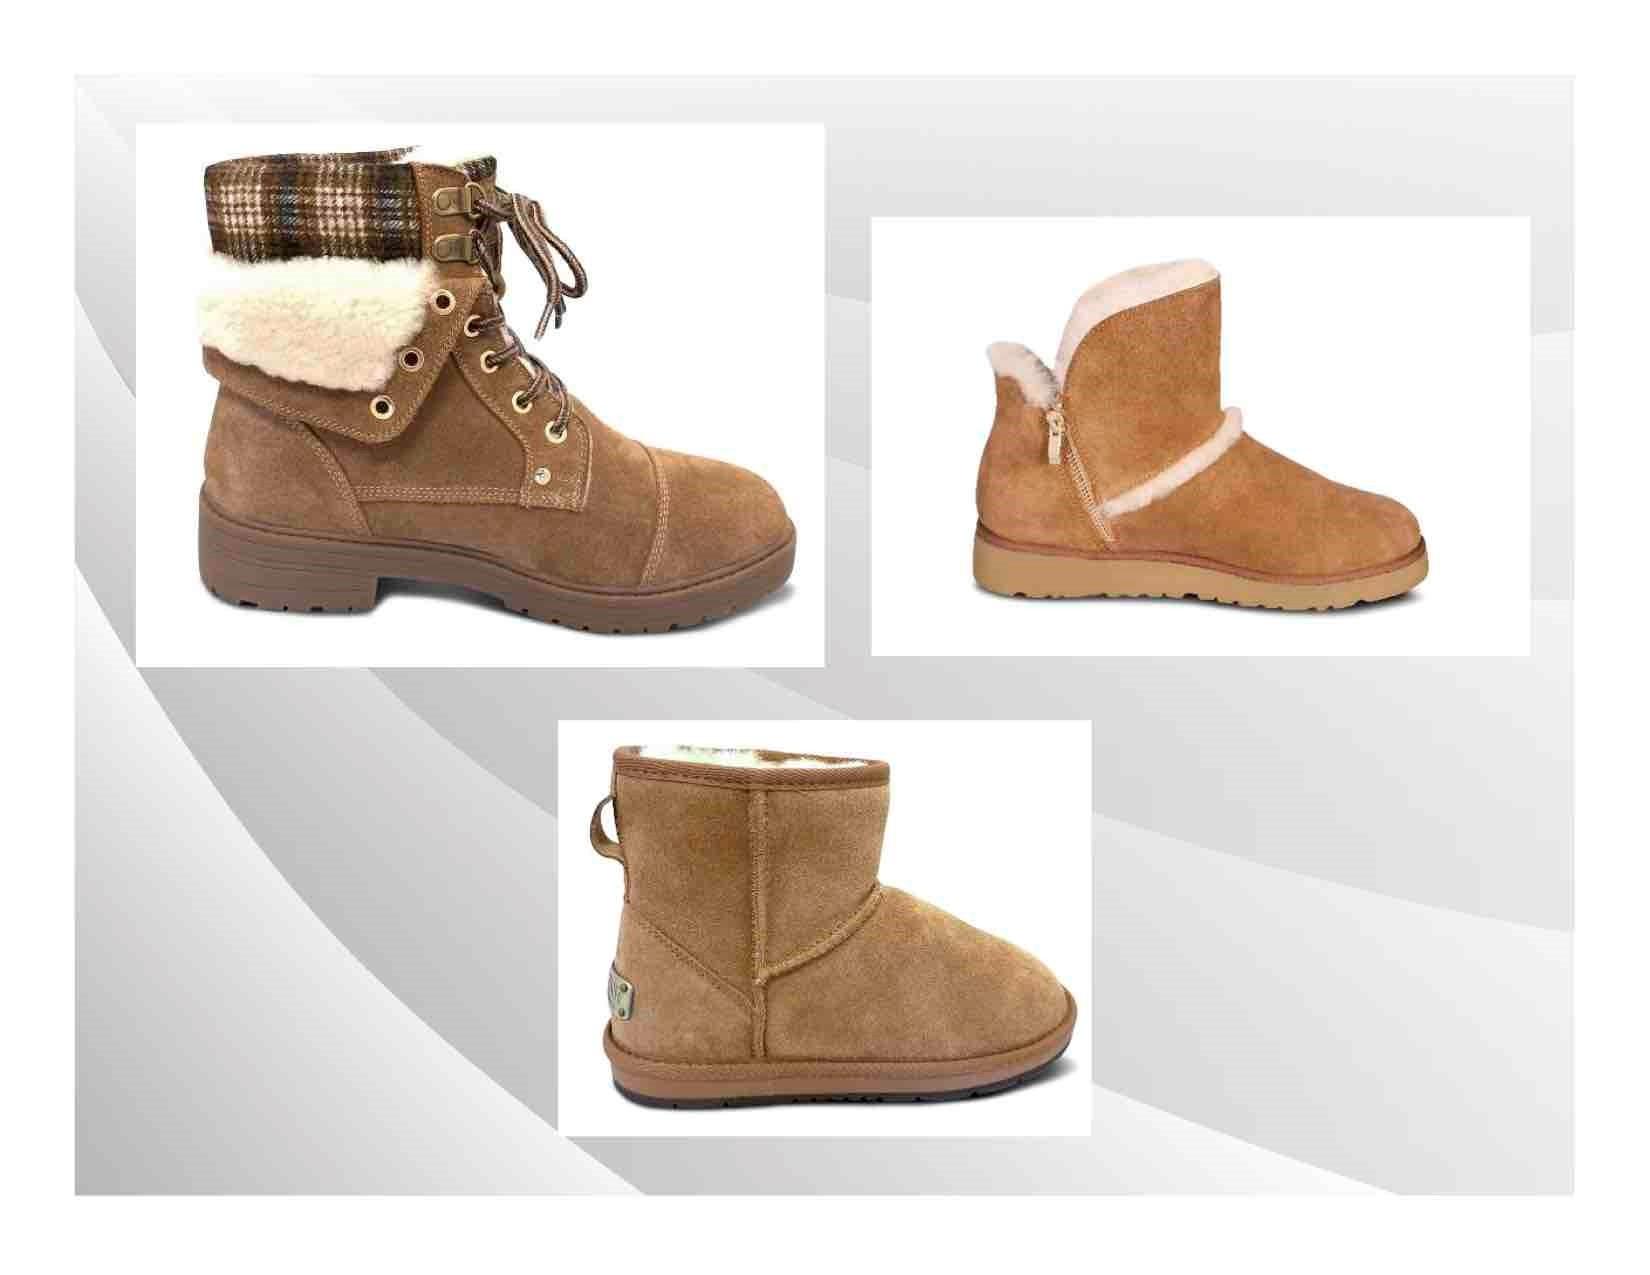 20% Off Boots from Sheepskin & Alpaca Specialties